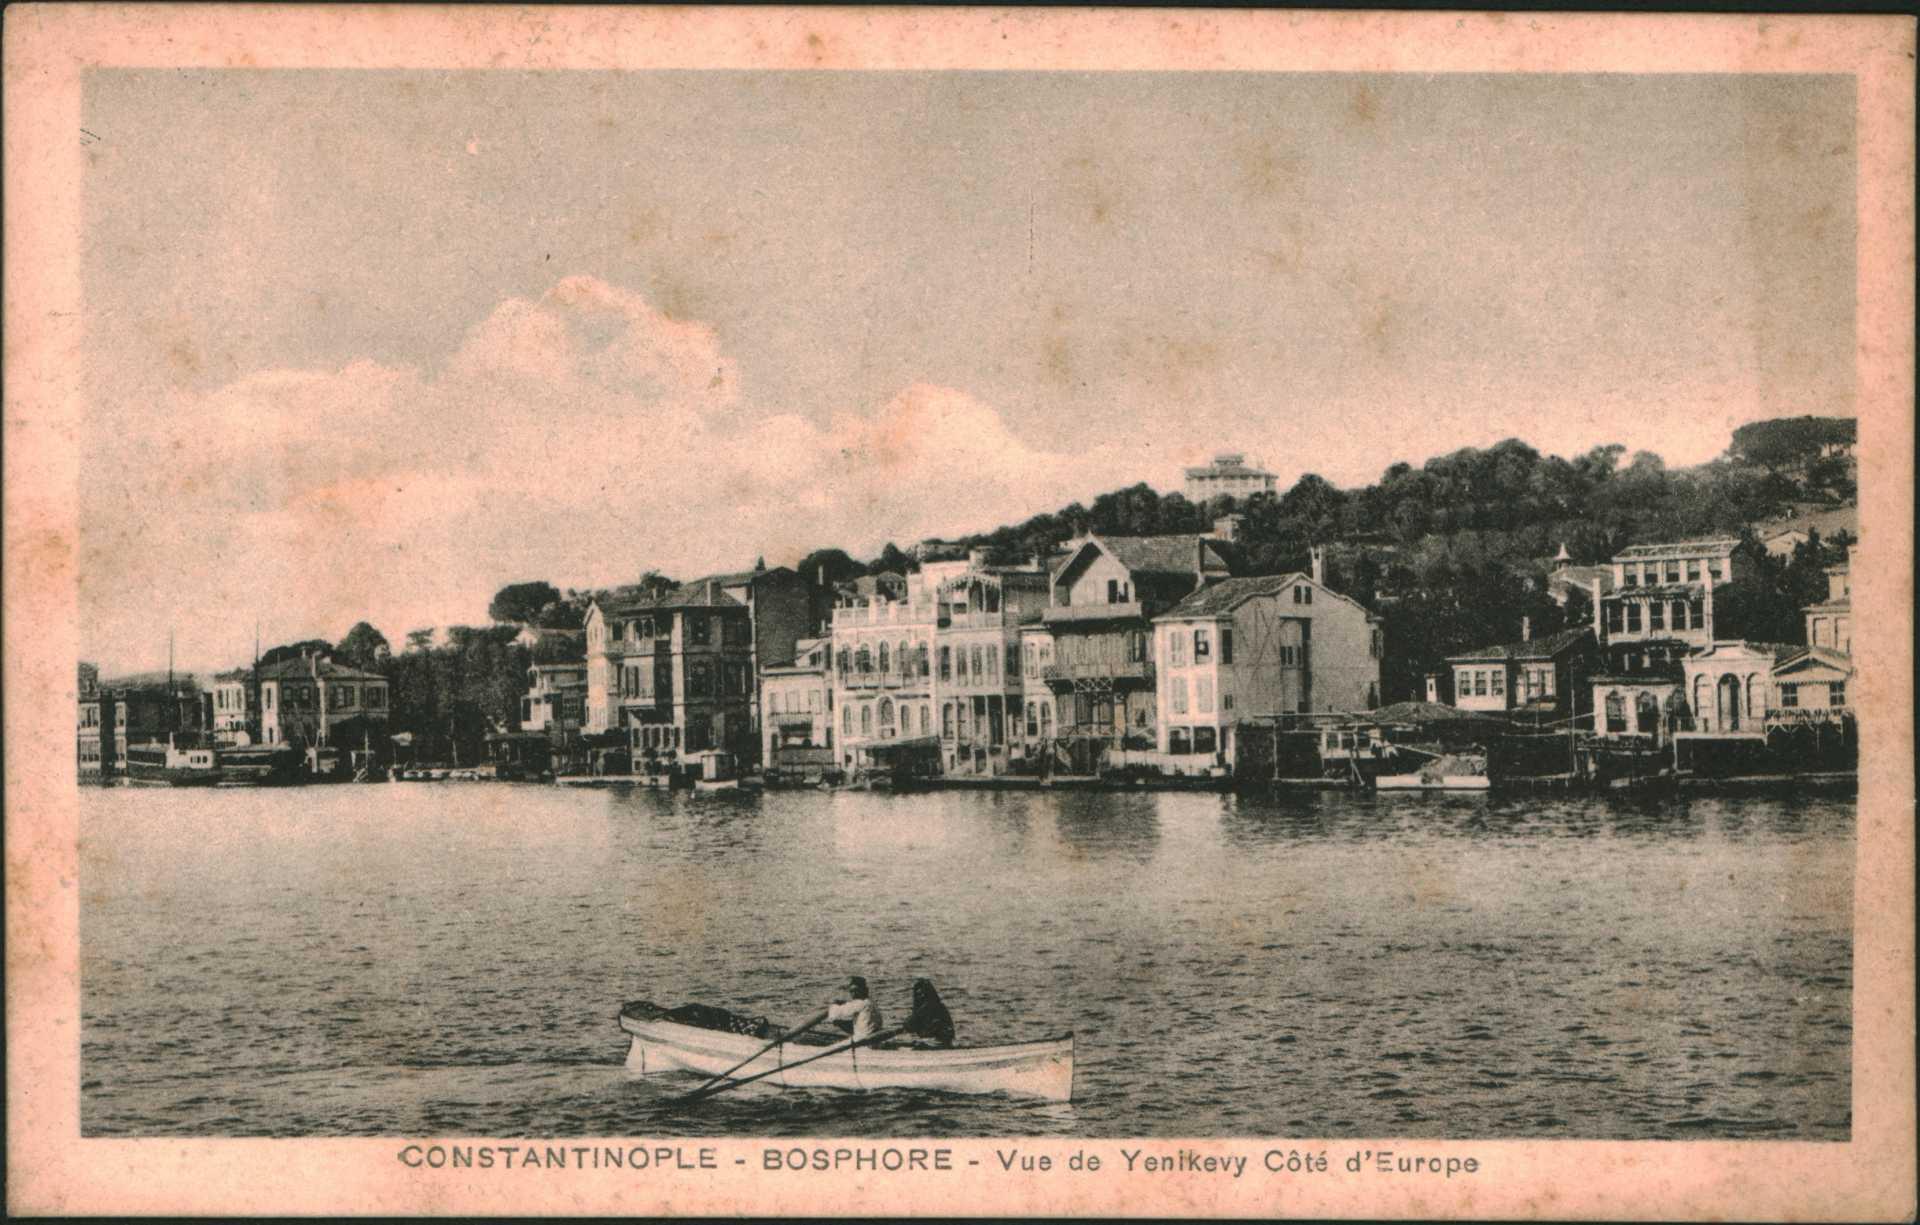 Constantinople-Bosphore- Vue de Yenikeuy cote d'Europe